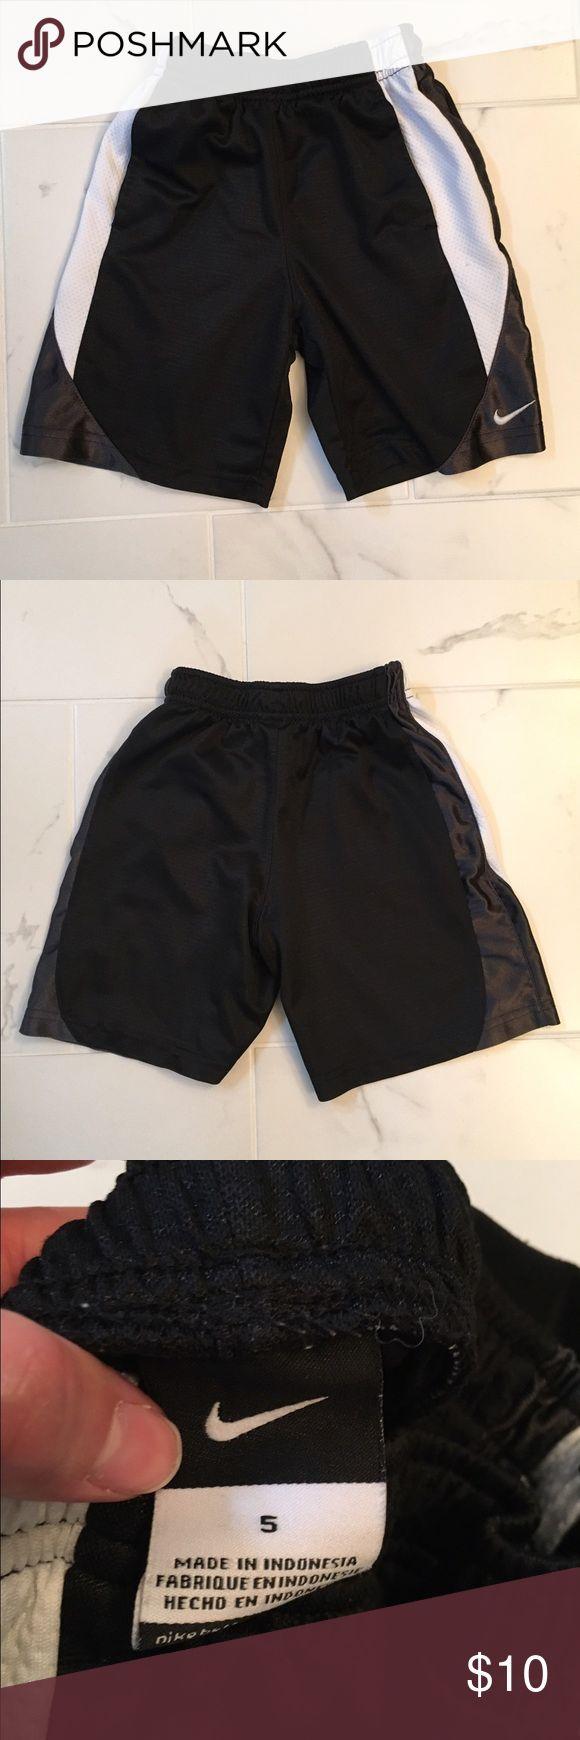 Boy's Nike shorts size 5 Nike boy's shorts size 5...gently worn Nike Bottoms Shorts